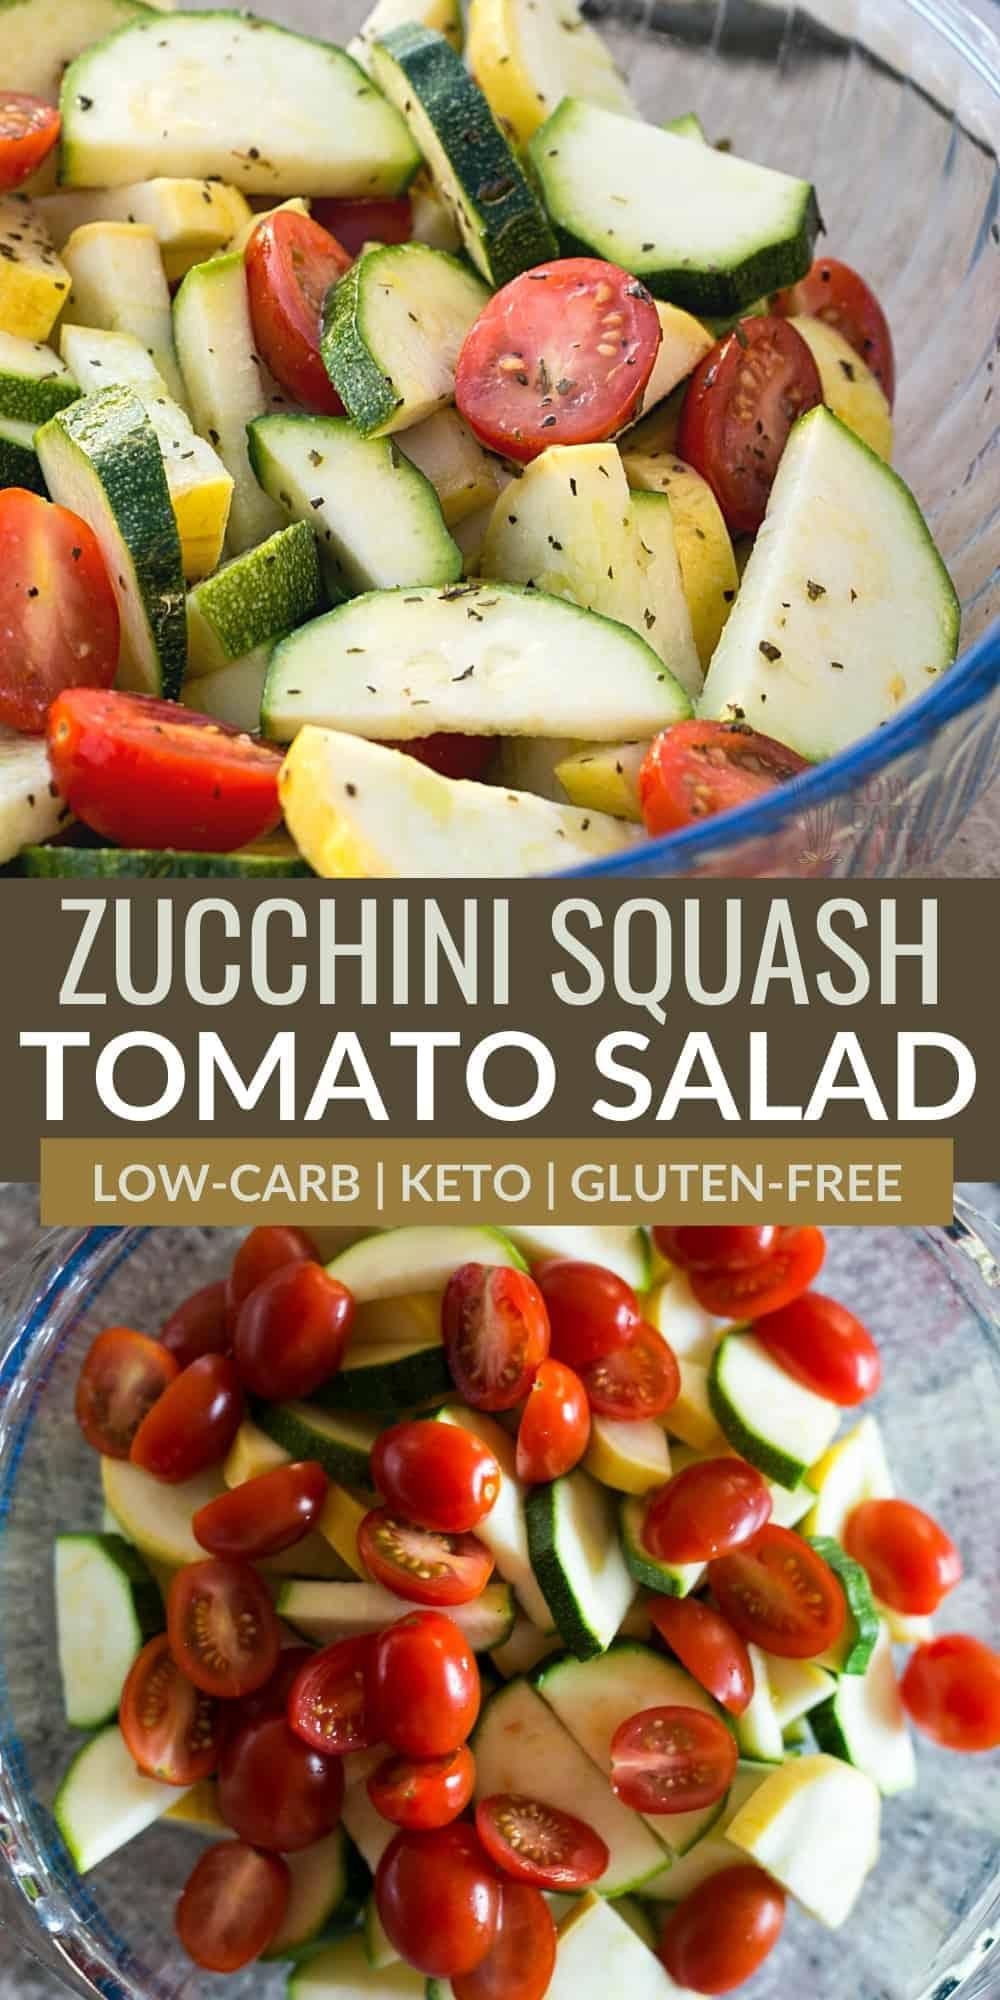 zucchini squash salad pinterest image